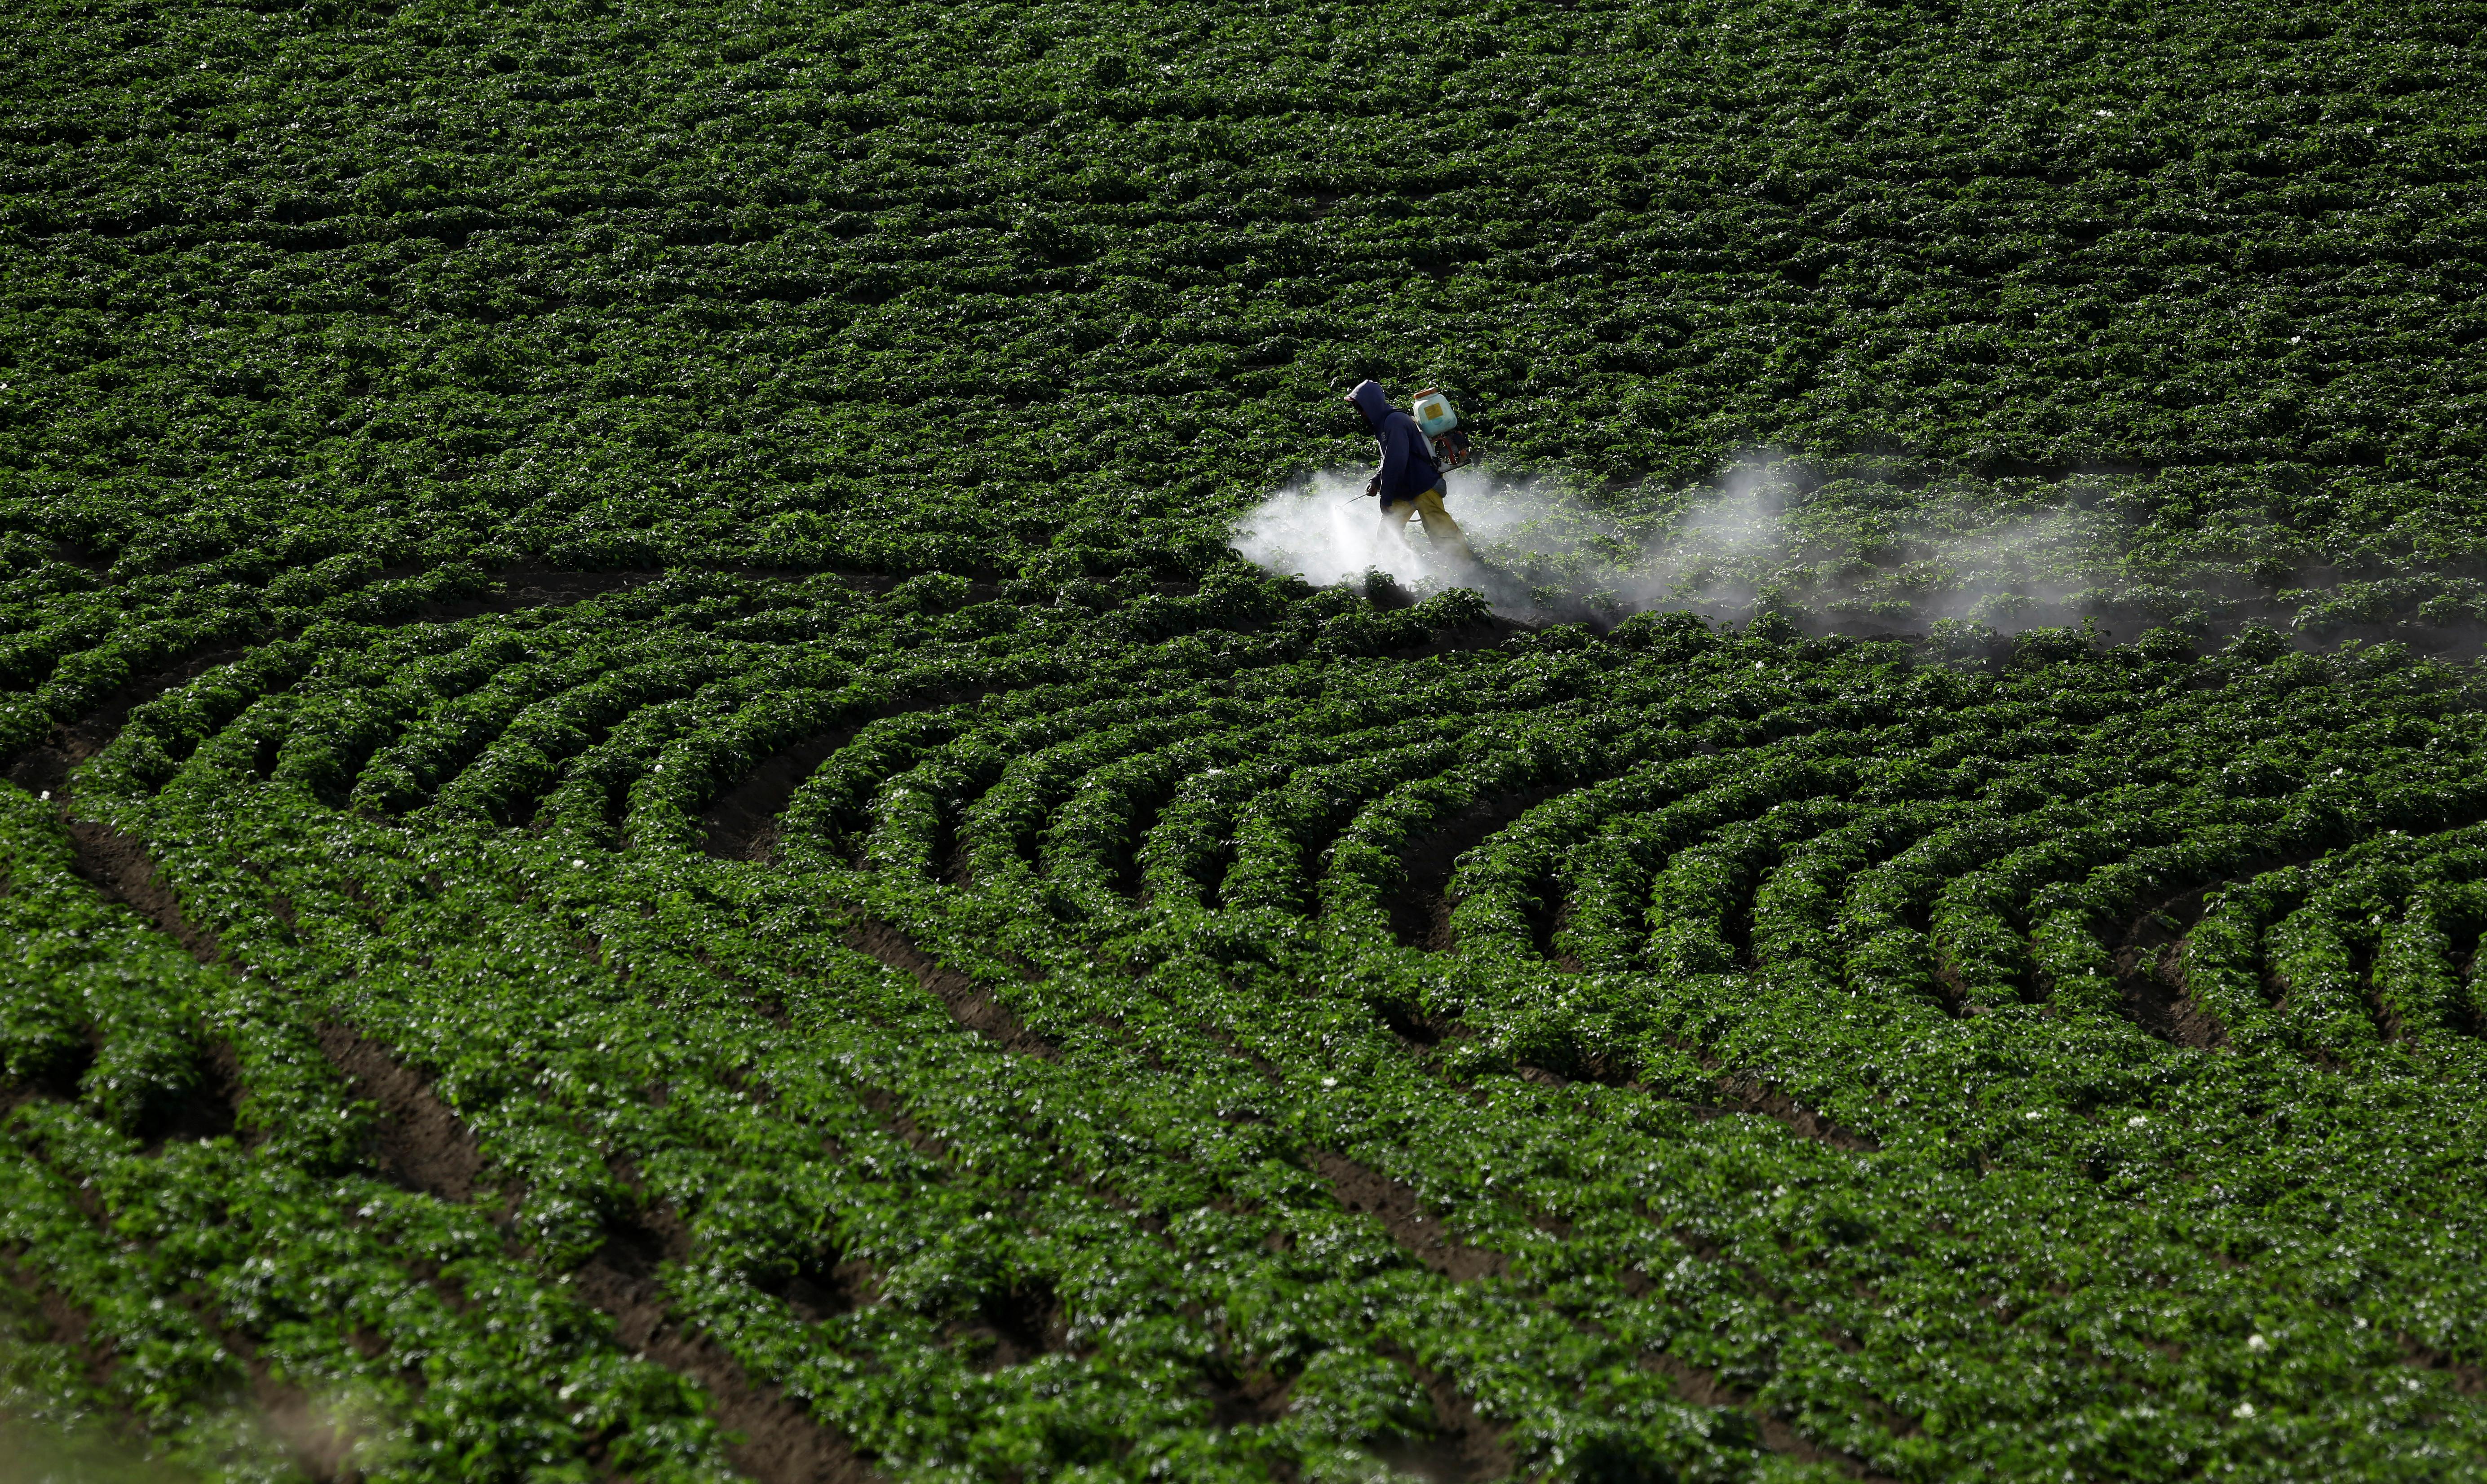 A farmer sprays a mixture of fertilizer and pesticide at a potato plantation in Cartago, Costa Rica April 27, 2018. REUTERS/Juan Carlos Ulate - RC13AF61E030